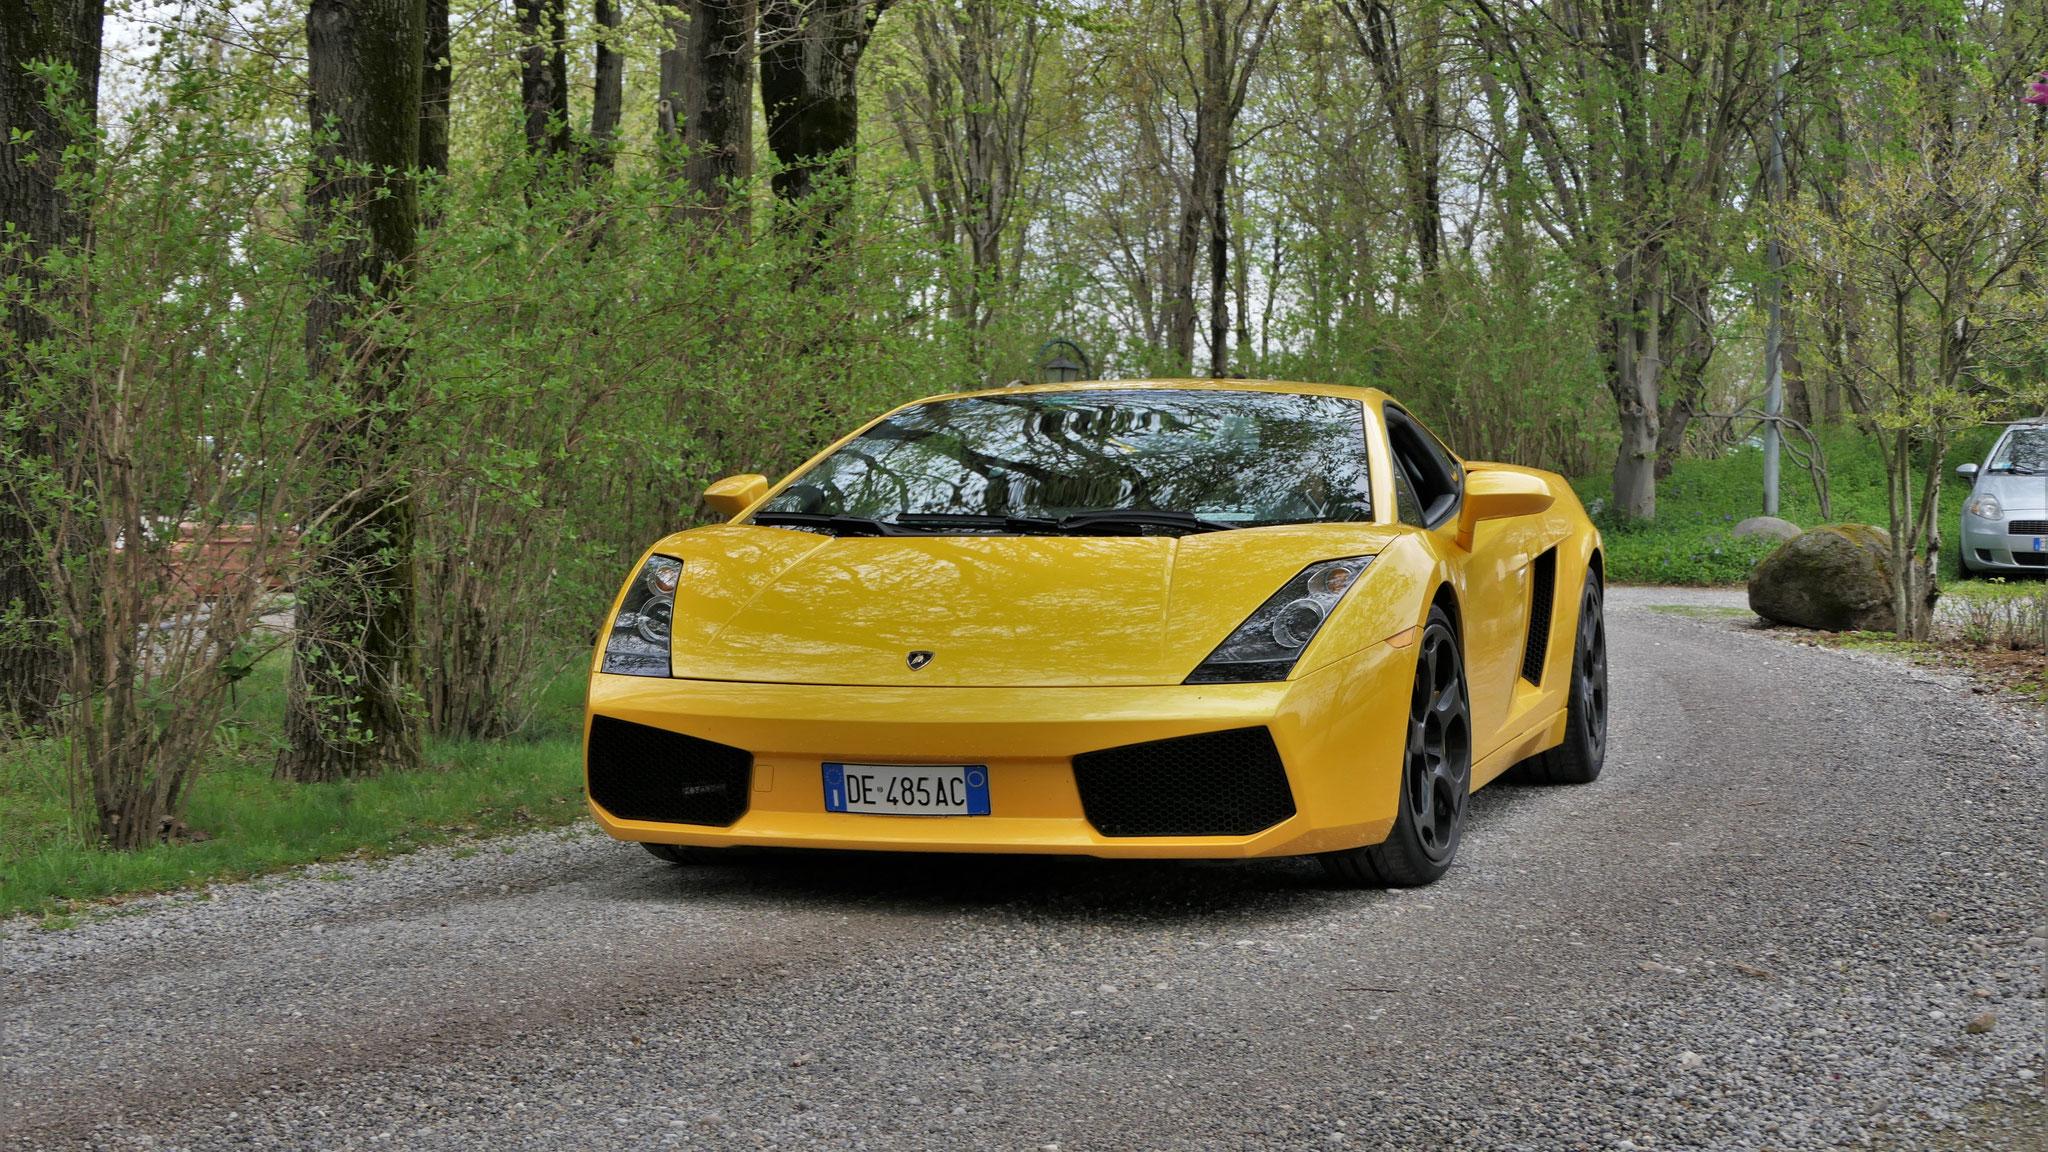 Lamborghini Gallardo - DE-485-AC (ITA)